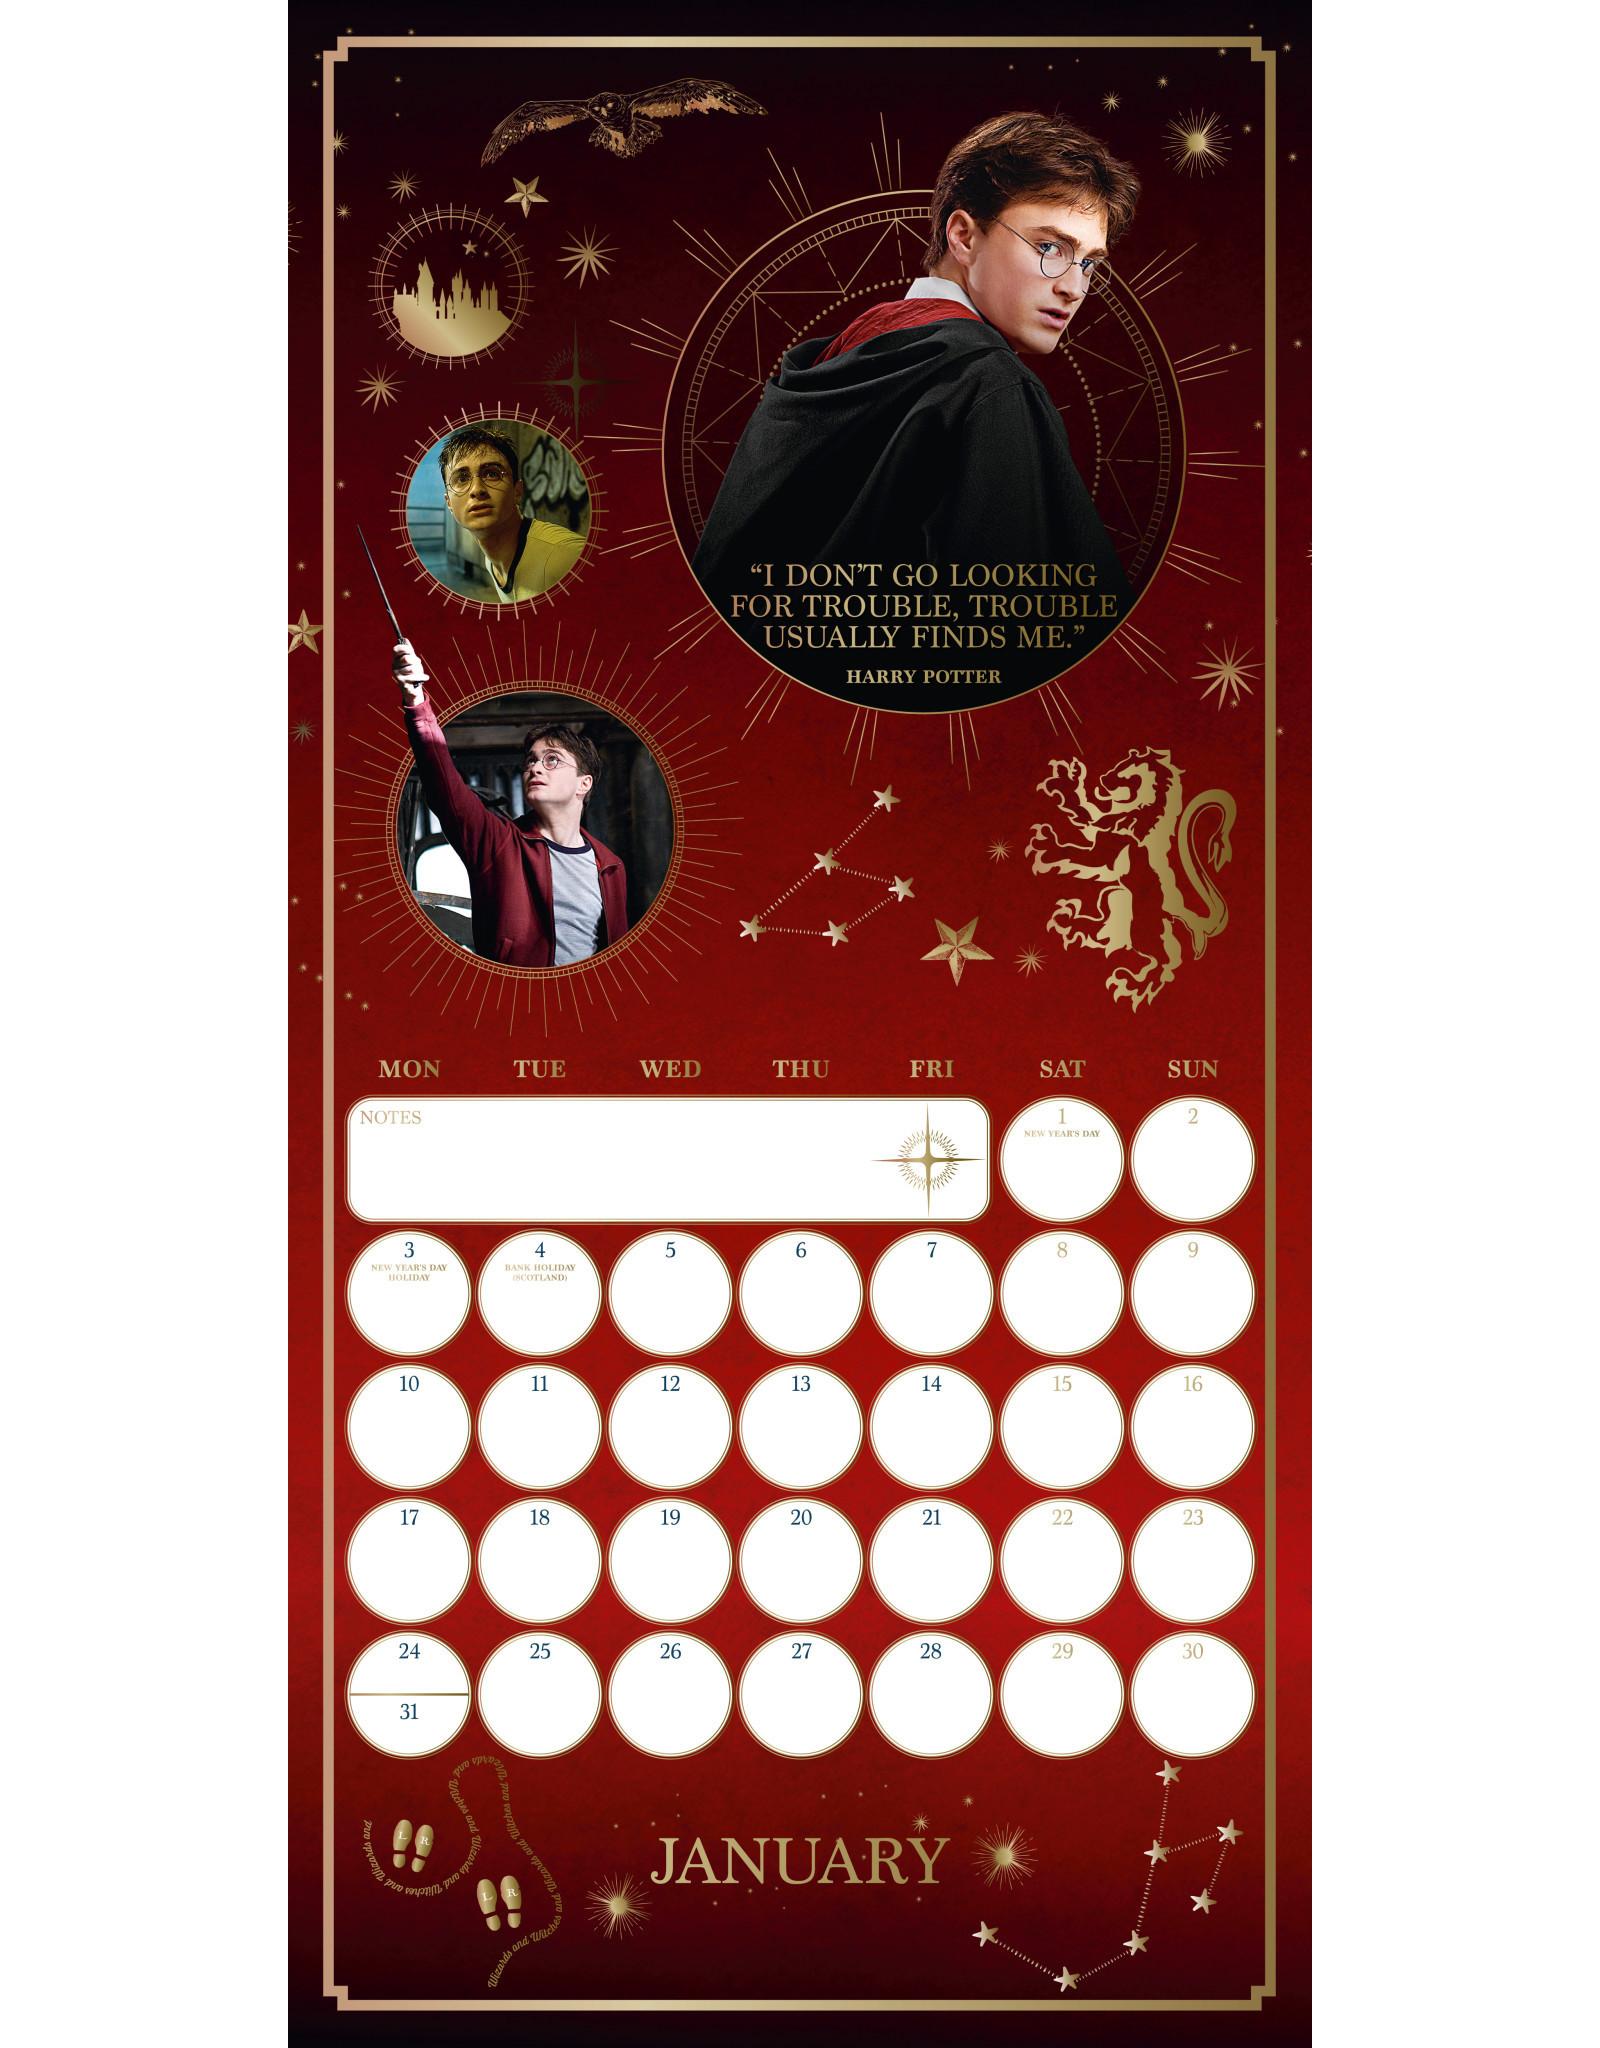 calendar 2022 of Harry Potter